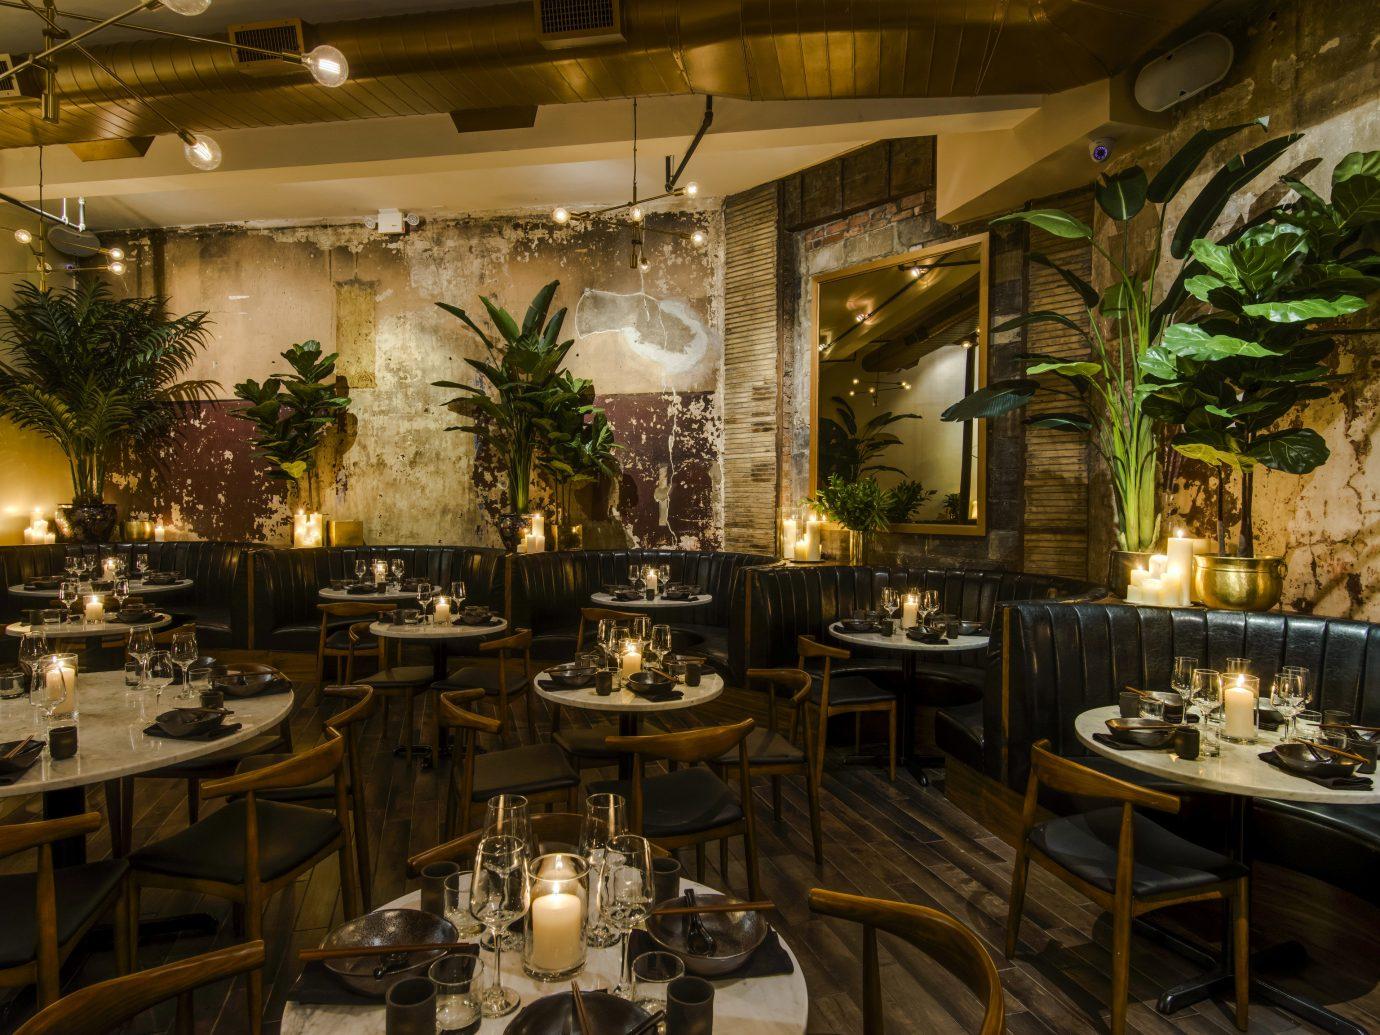 Arts + Culture table indoor meal restaurant function hall floristry interior design Dining estate buffet Lobby ballroom several dining room dining table